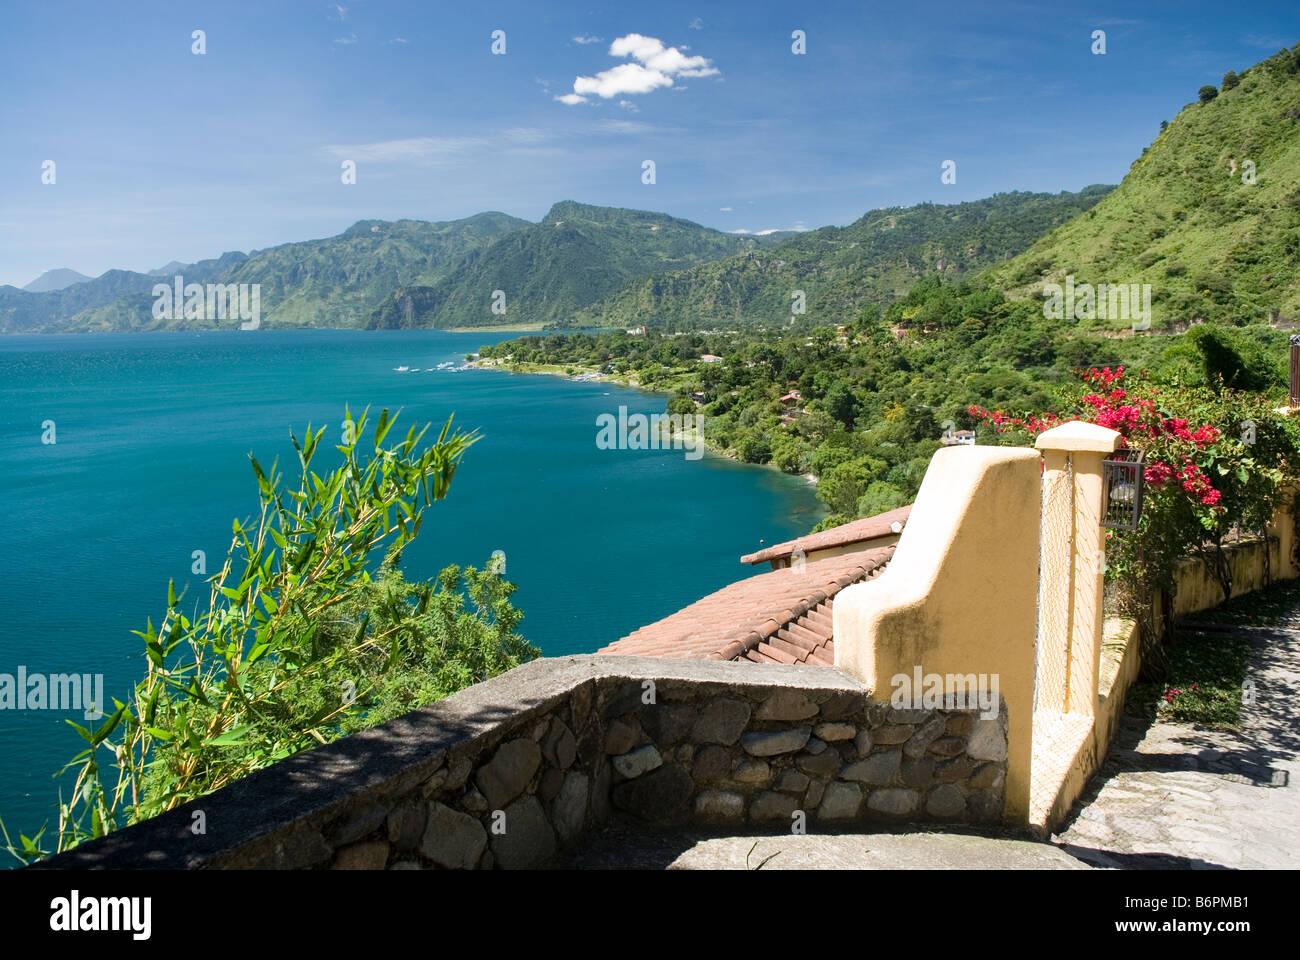 Lago de Atitlan, seen from Santa Catarina Palopo, Guatemala. - Stock Image